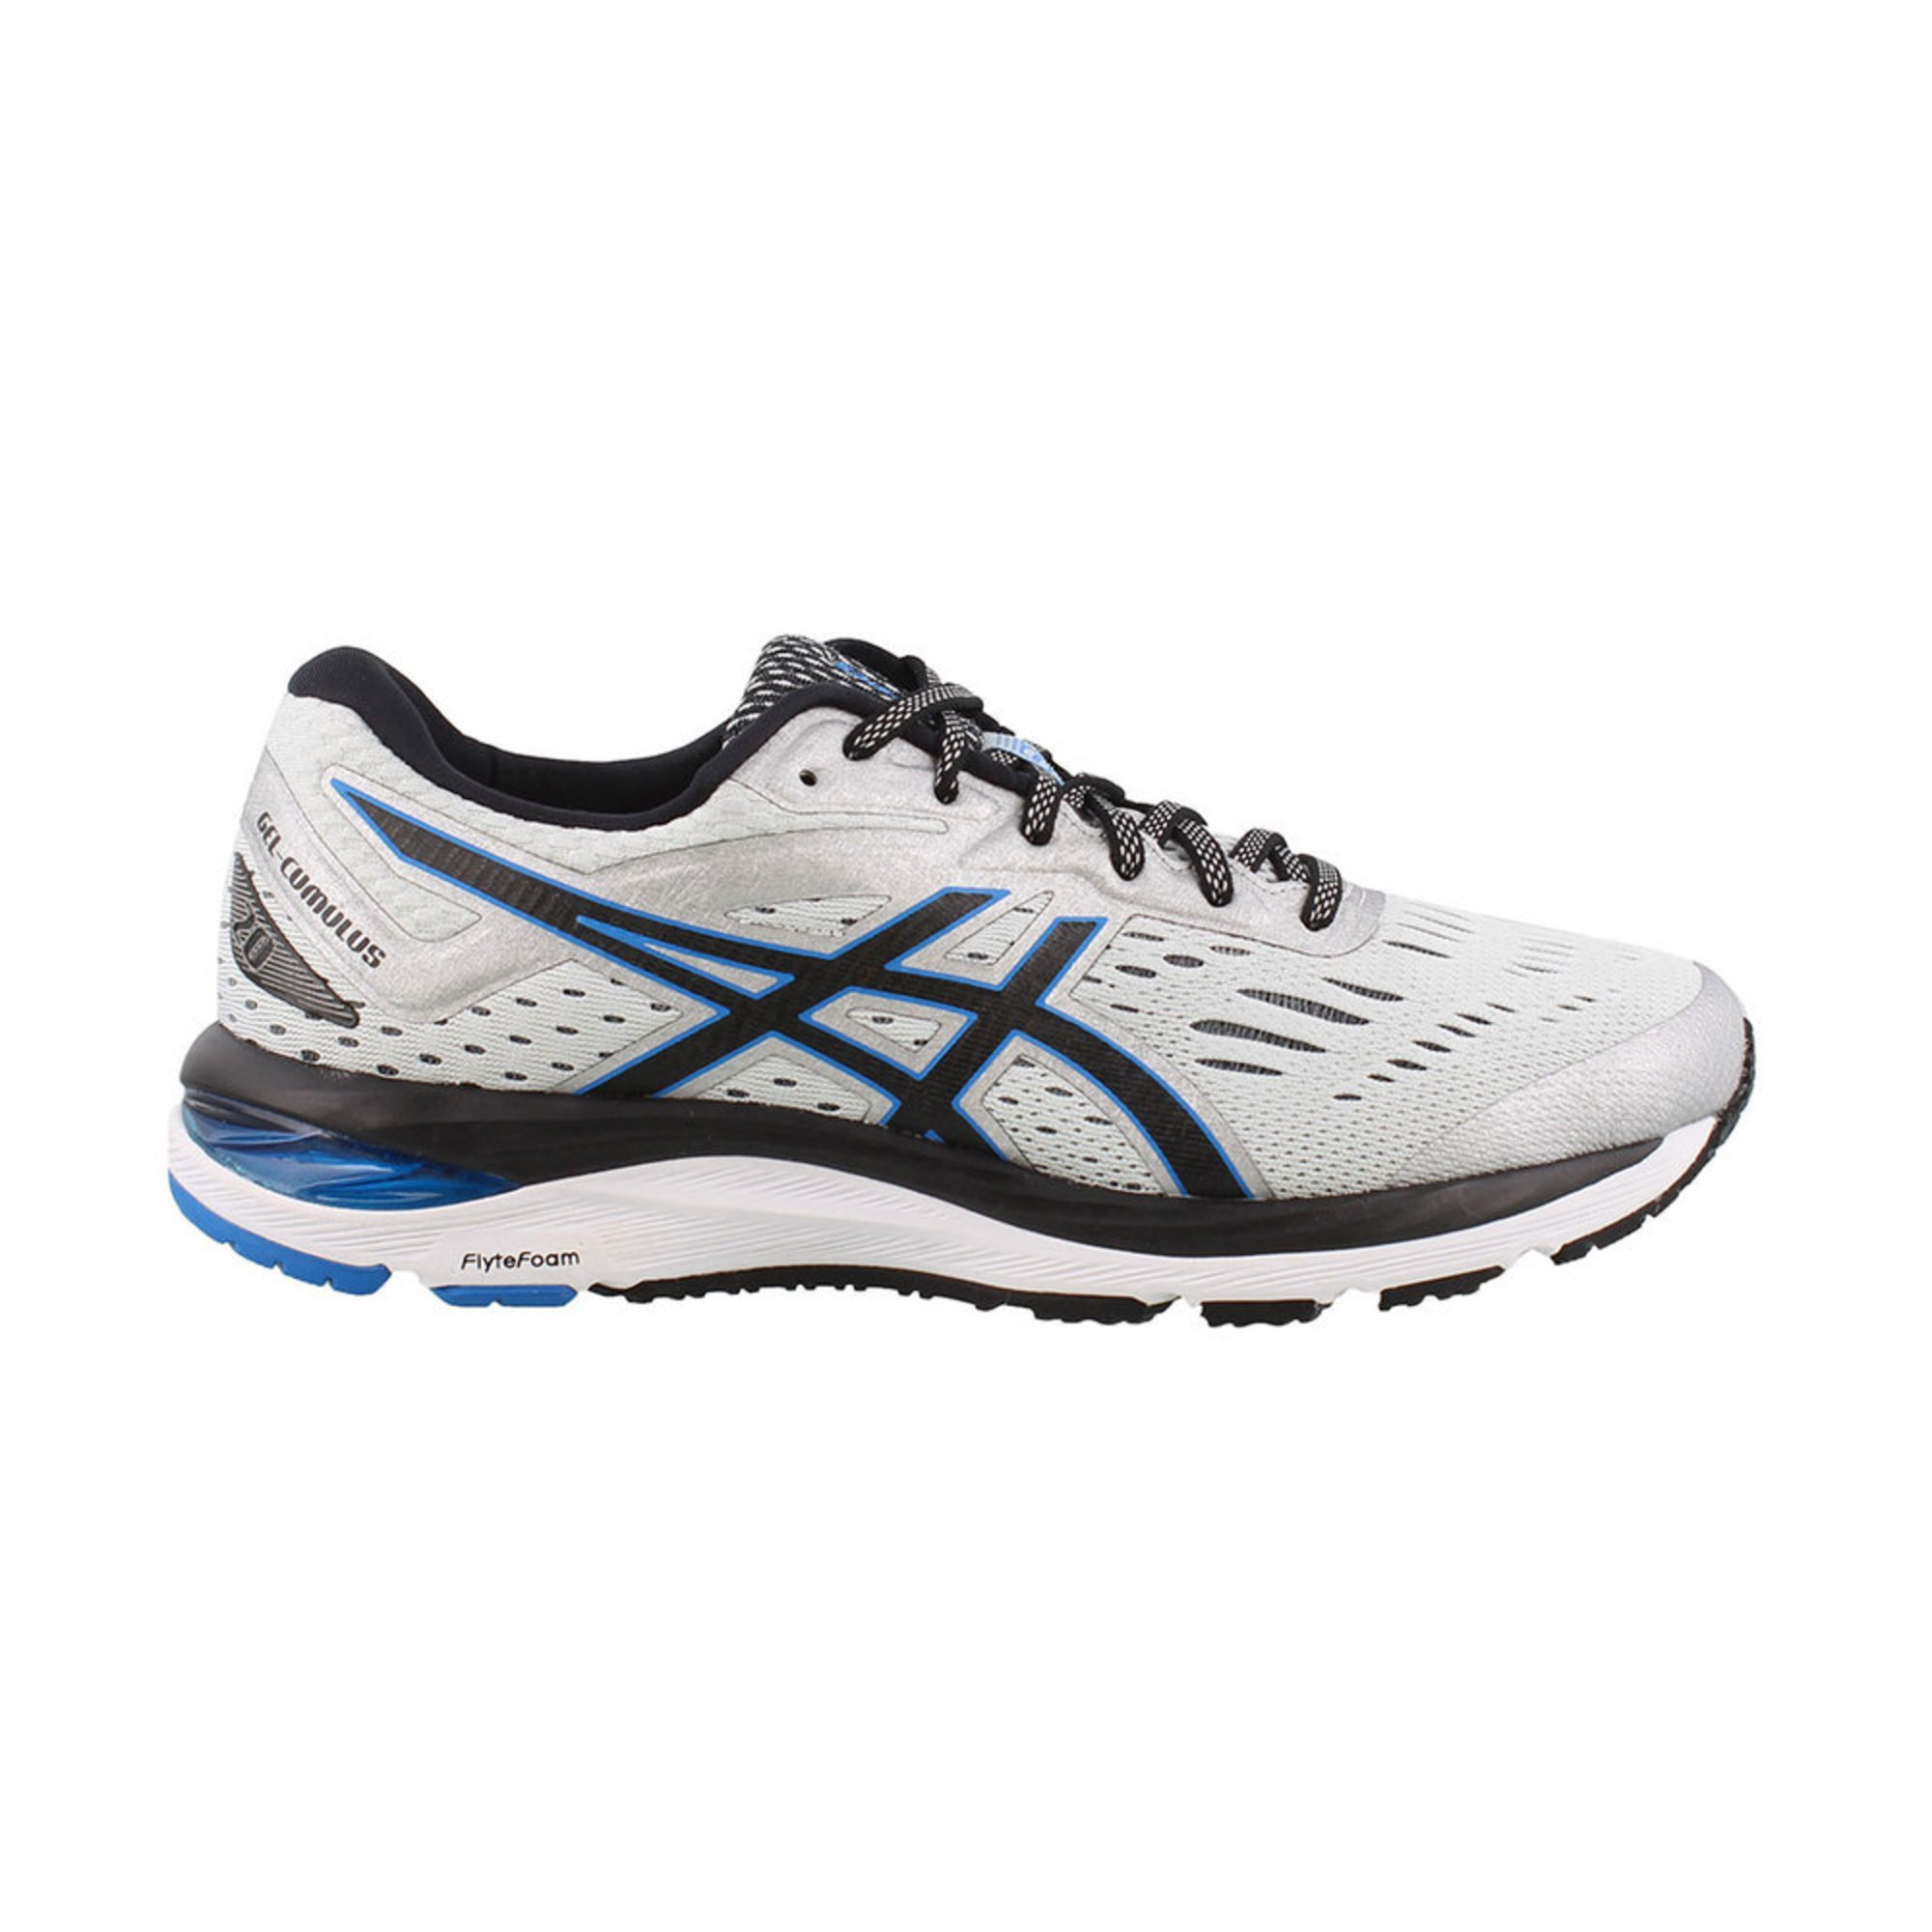 online retailer 47b2d 98713 Asics Men's Gel Cumulus 20 Running Shoe